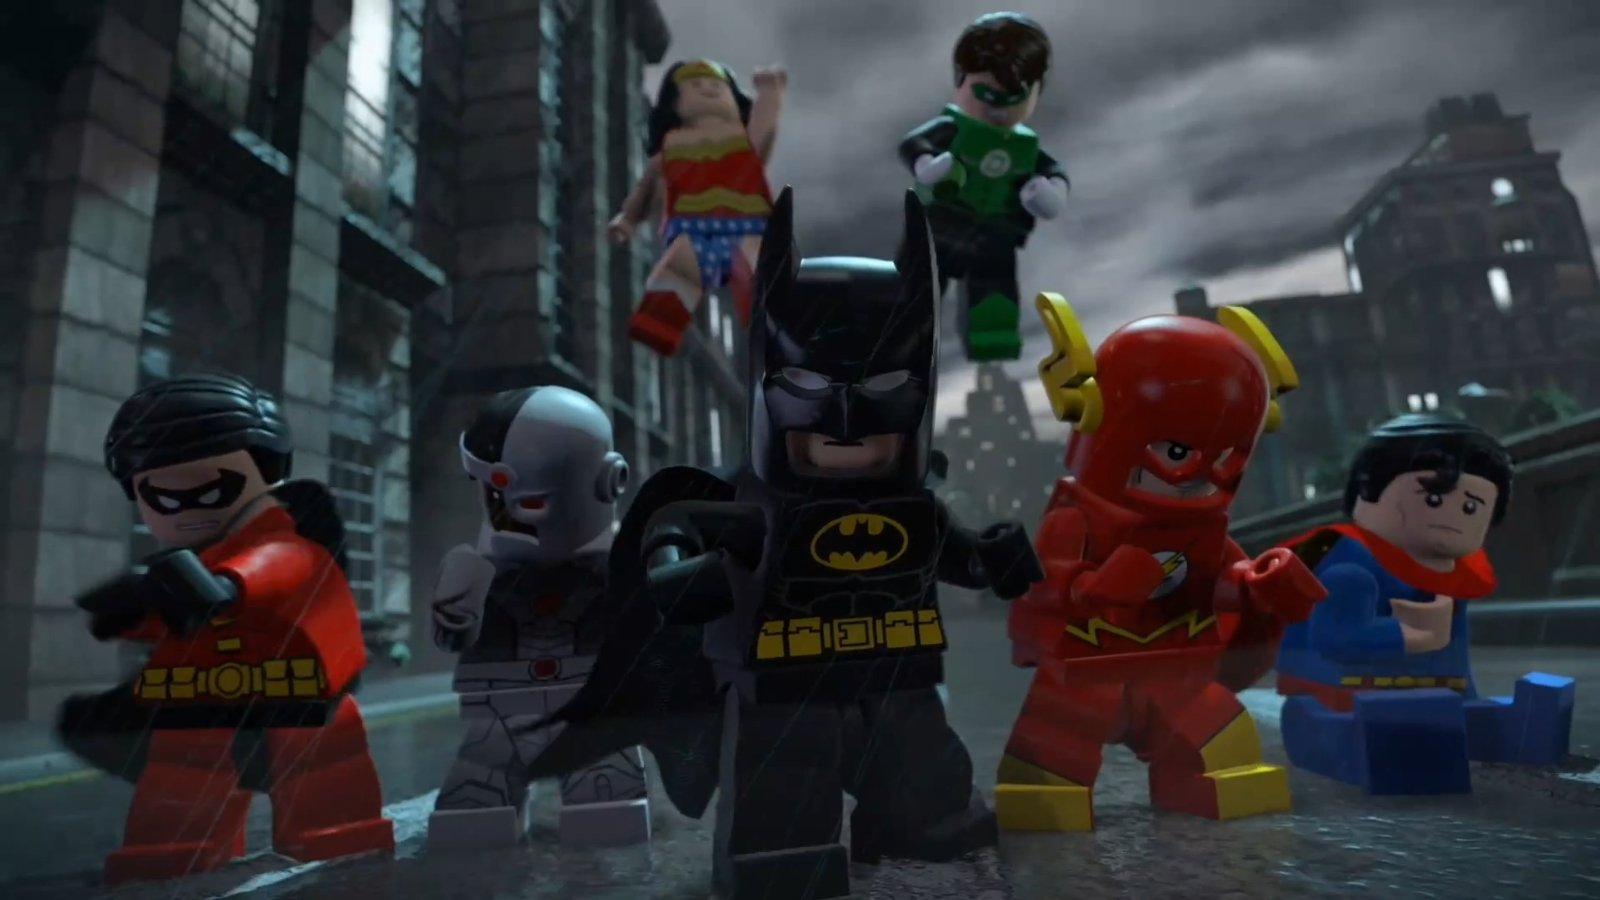 Lego Batman - Lego Batman The Movie Game , HD Wallpaper & Backgrounds